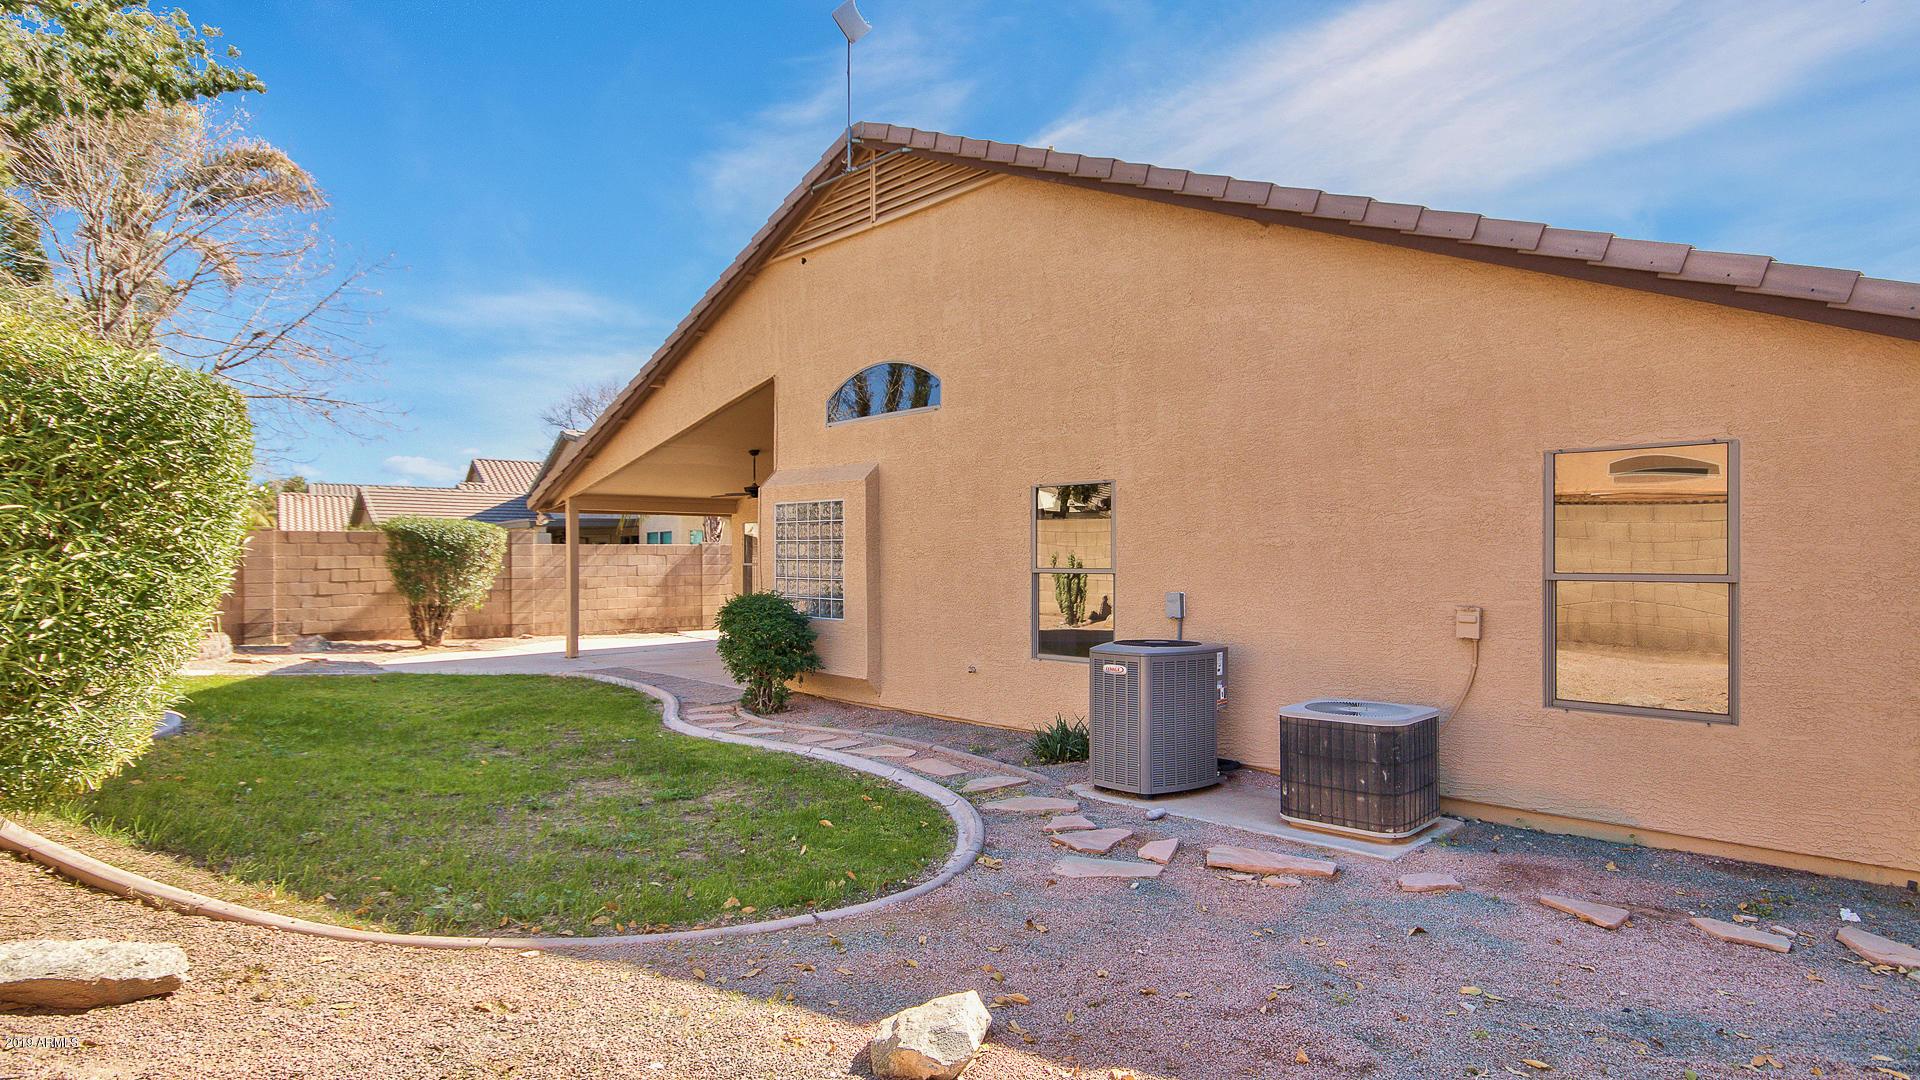 MLS 5877913 9812 E PAMPA Avenue, Mesa, AZ 85212 Mesa AZ Mesquite Canyon